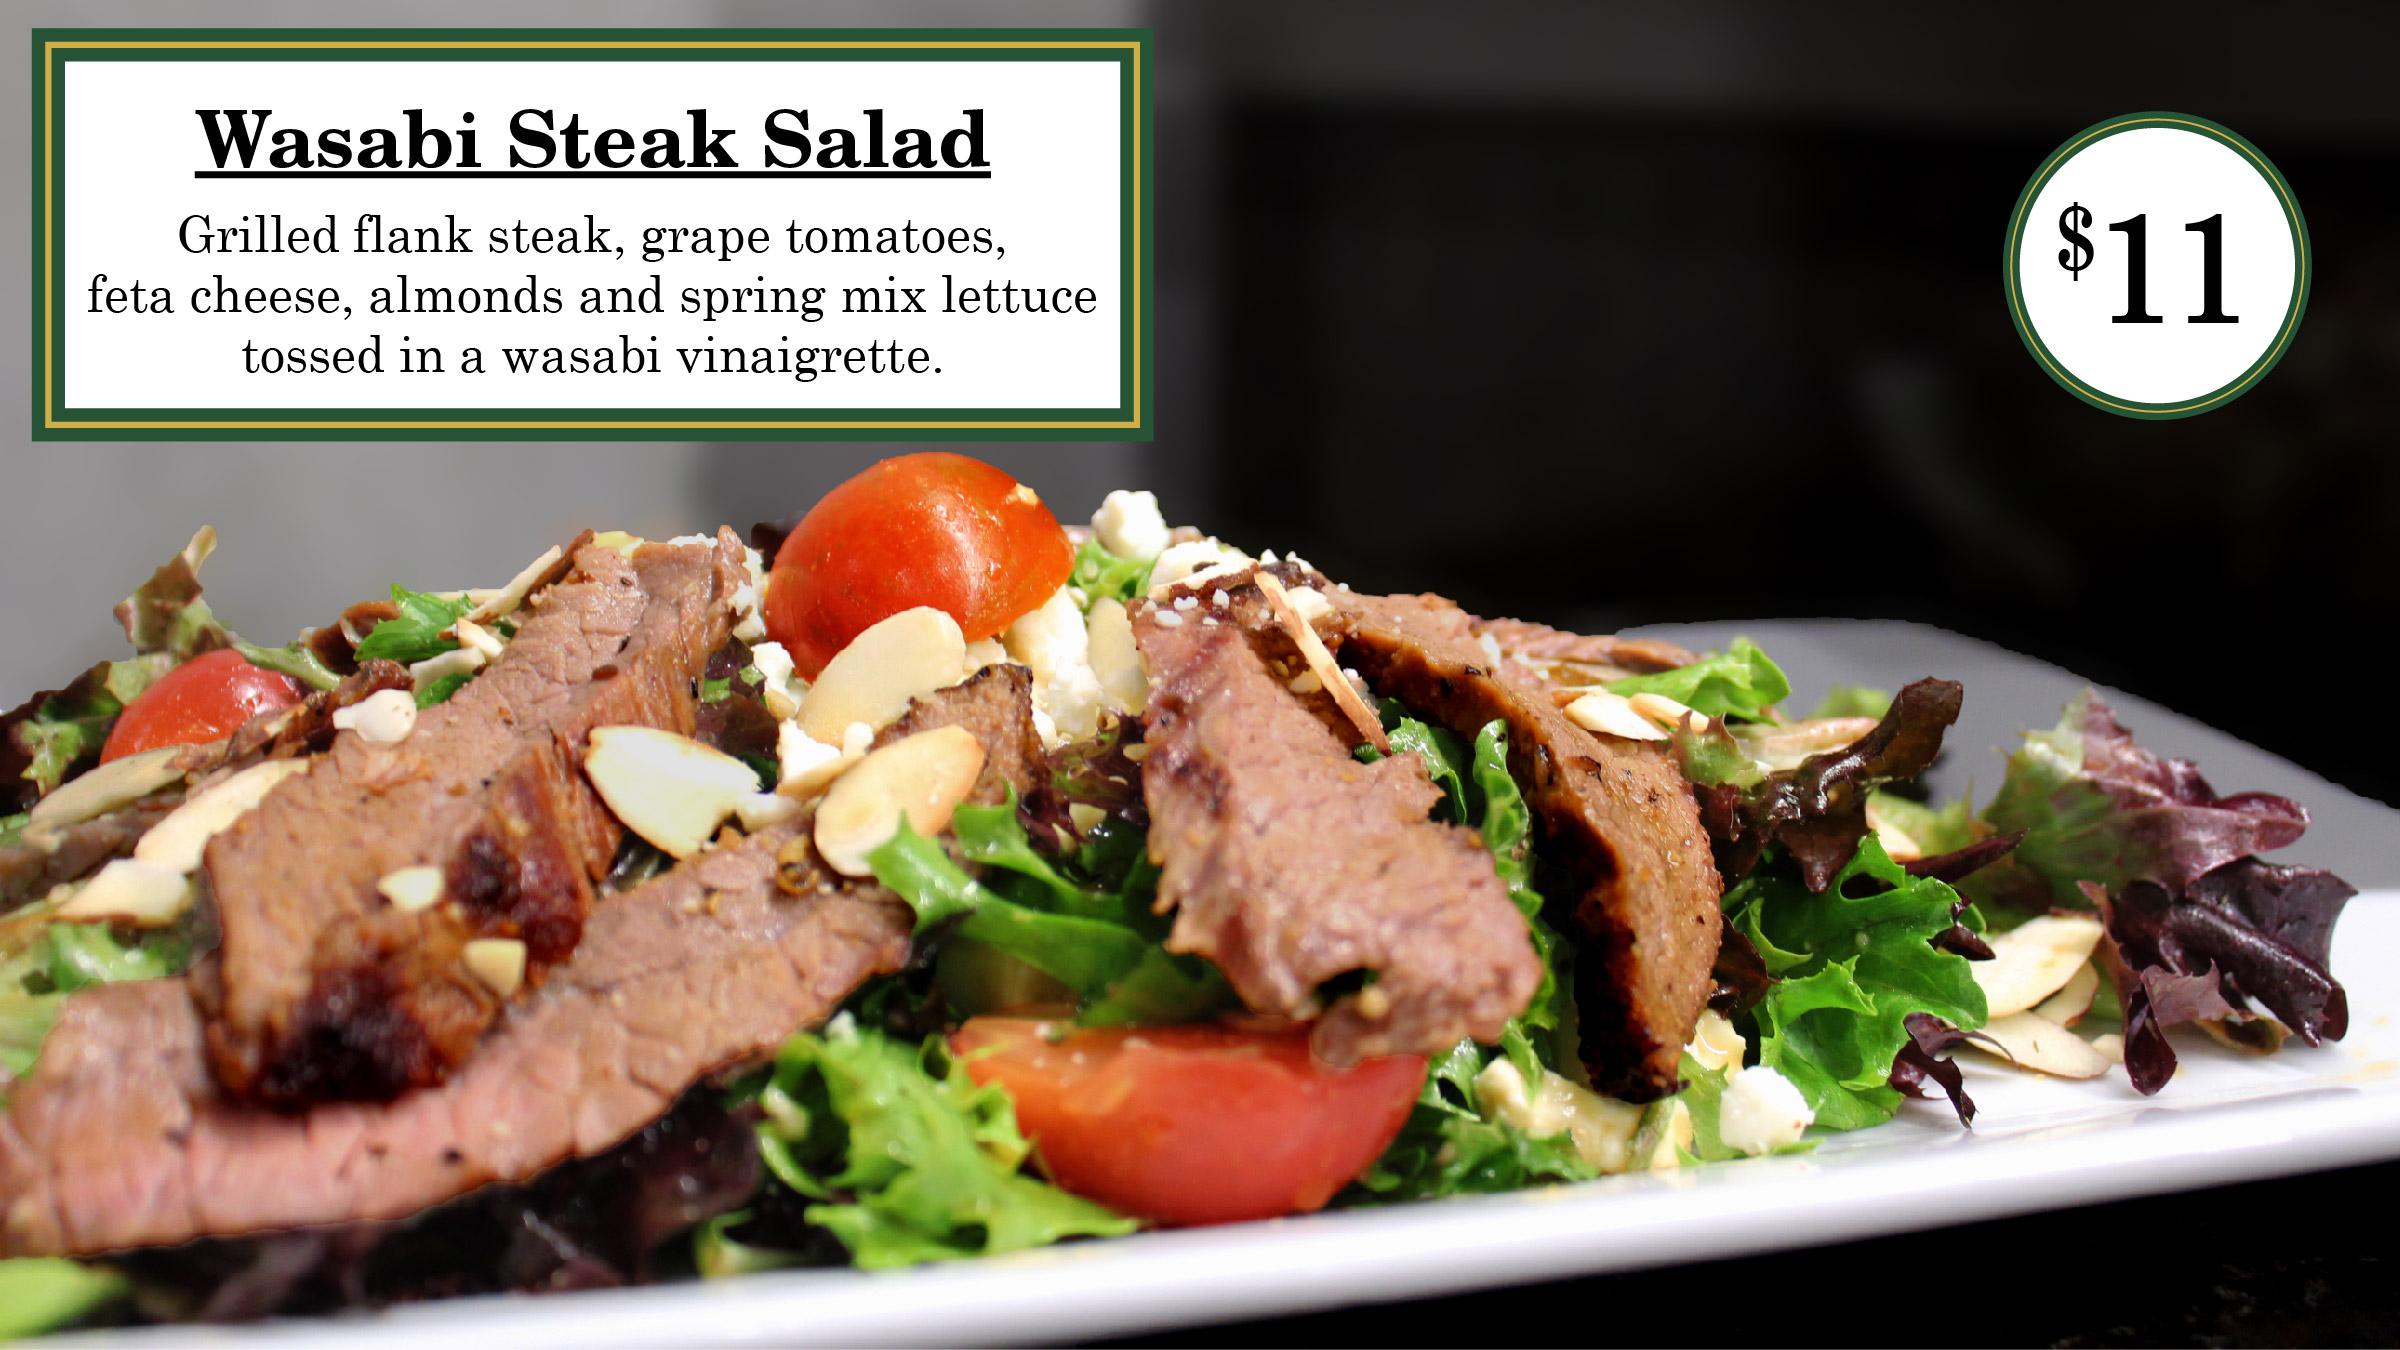 Wasabi Steak Salad.jpg